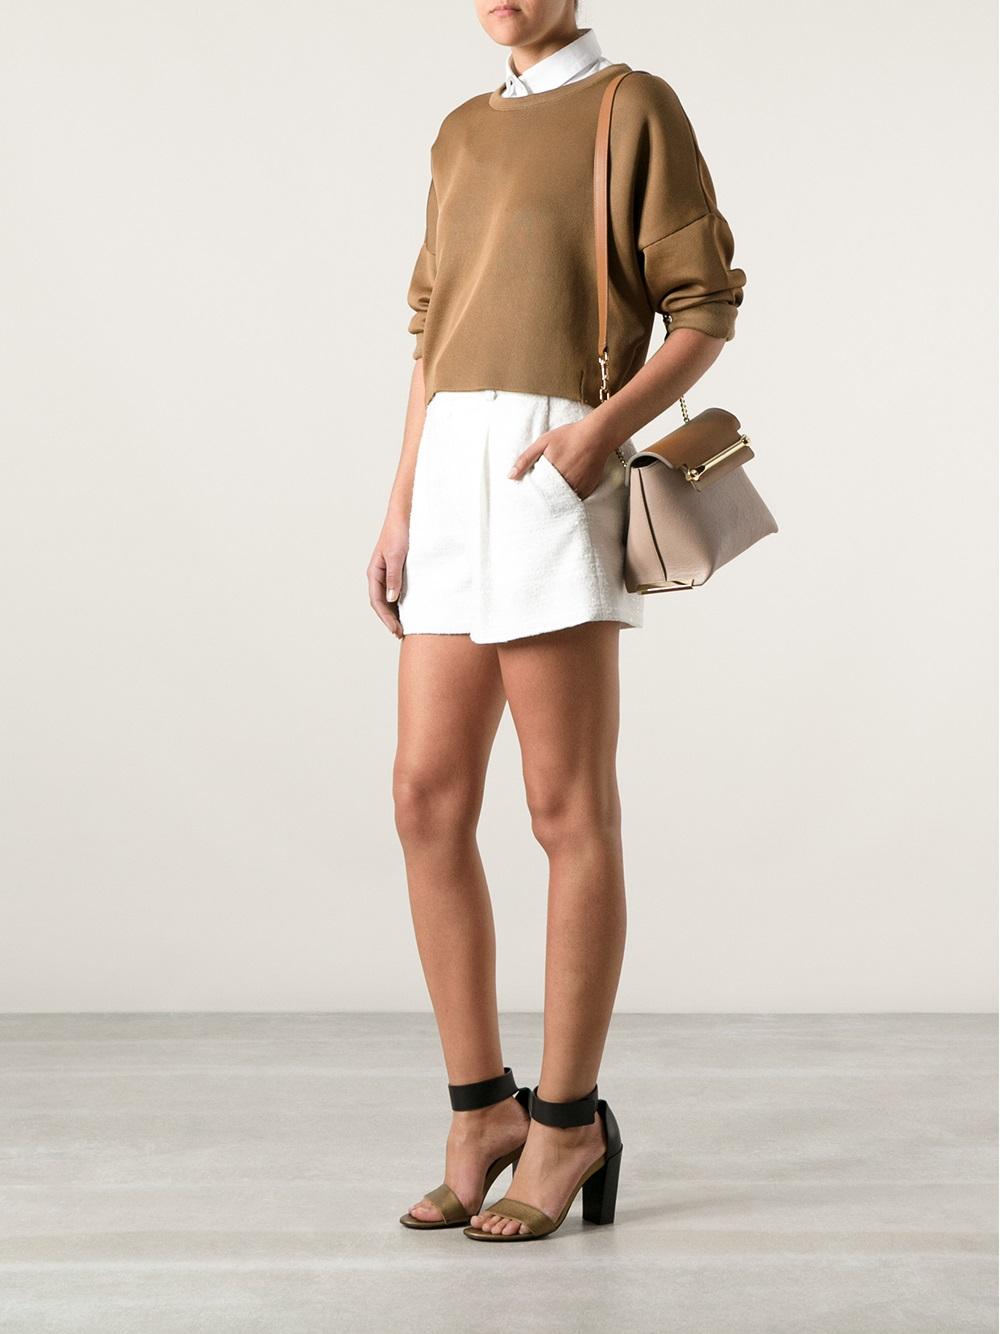 Chlo¨¦ Small \u0026#39;Clare\u0026#39; Shoulder Bag in Brown | Lyst